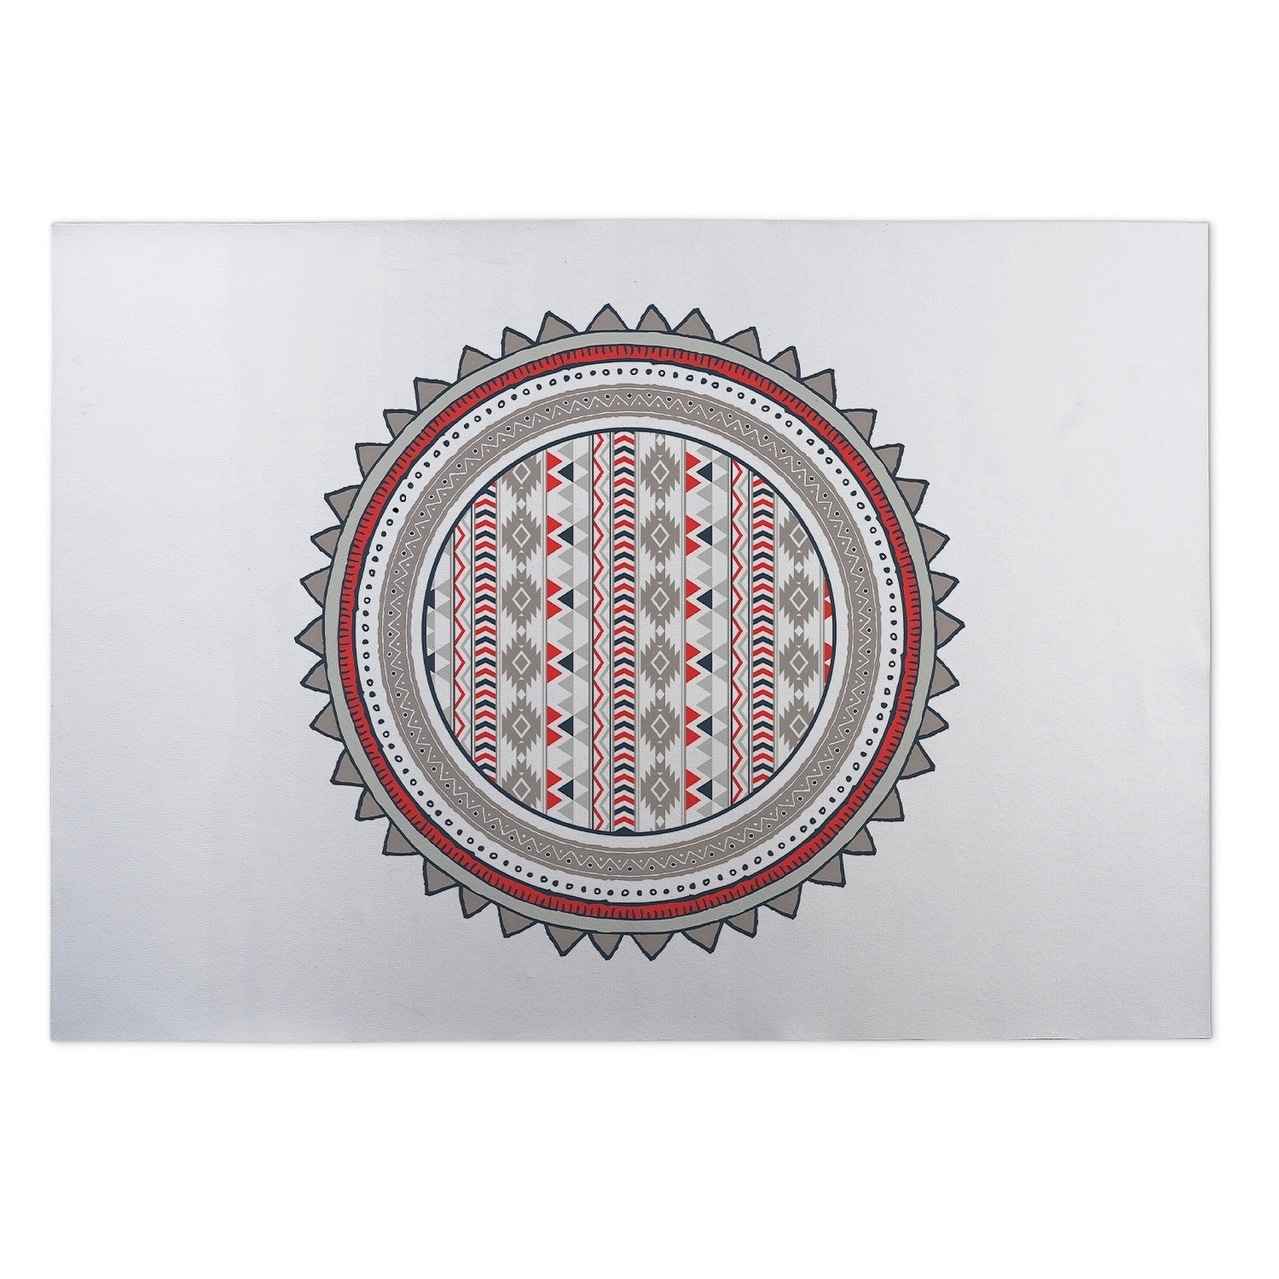 Kavka Designs Grey/ Red/ White Tribal Tango Red 2 x 3 Indoor/ Outdoor Floor Mat (Grey - N/A - Rustic)